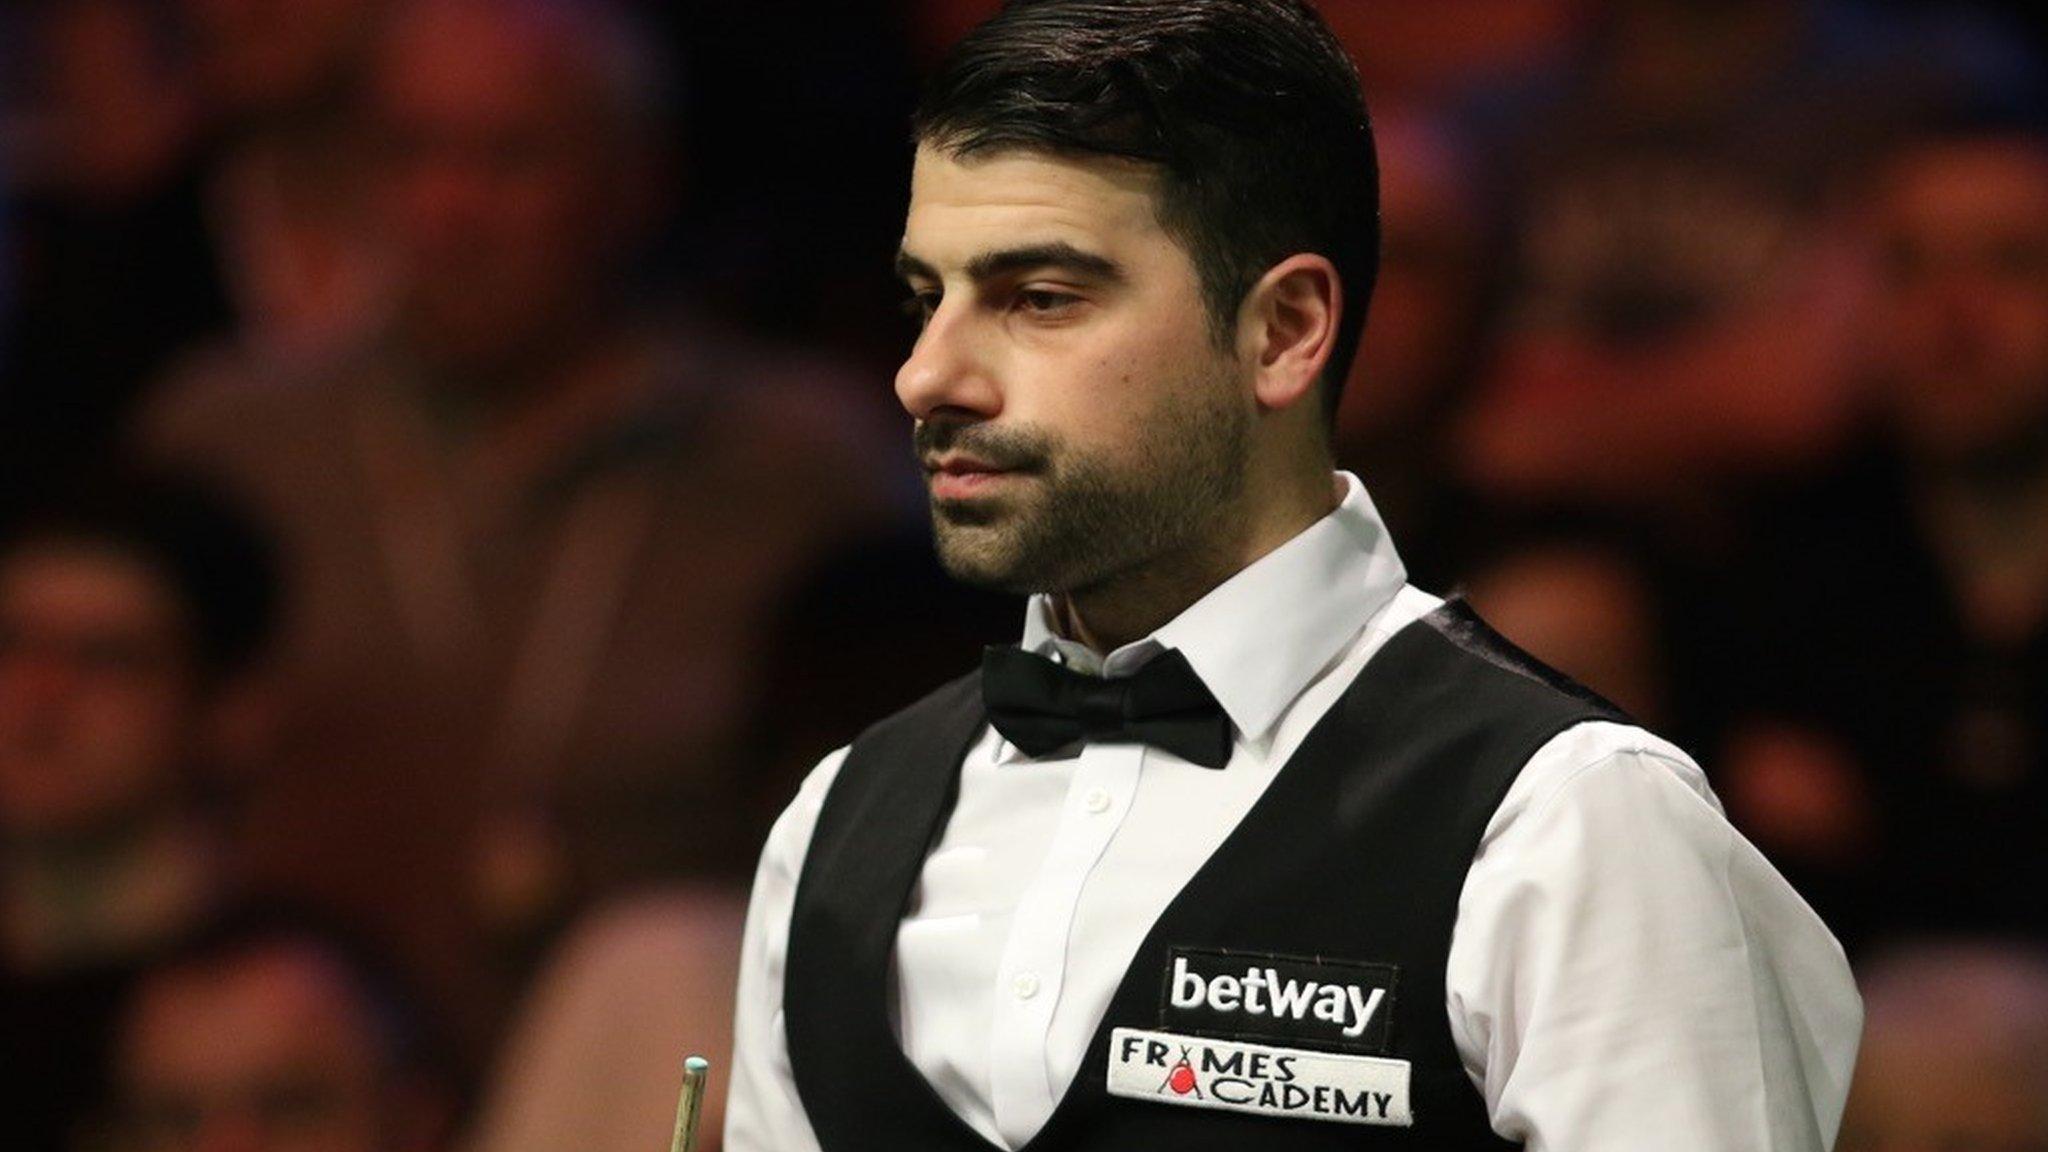 Snooker Shoot Out: Michael Georgiou beats Graeme Dott to win title